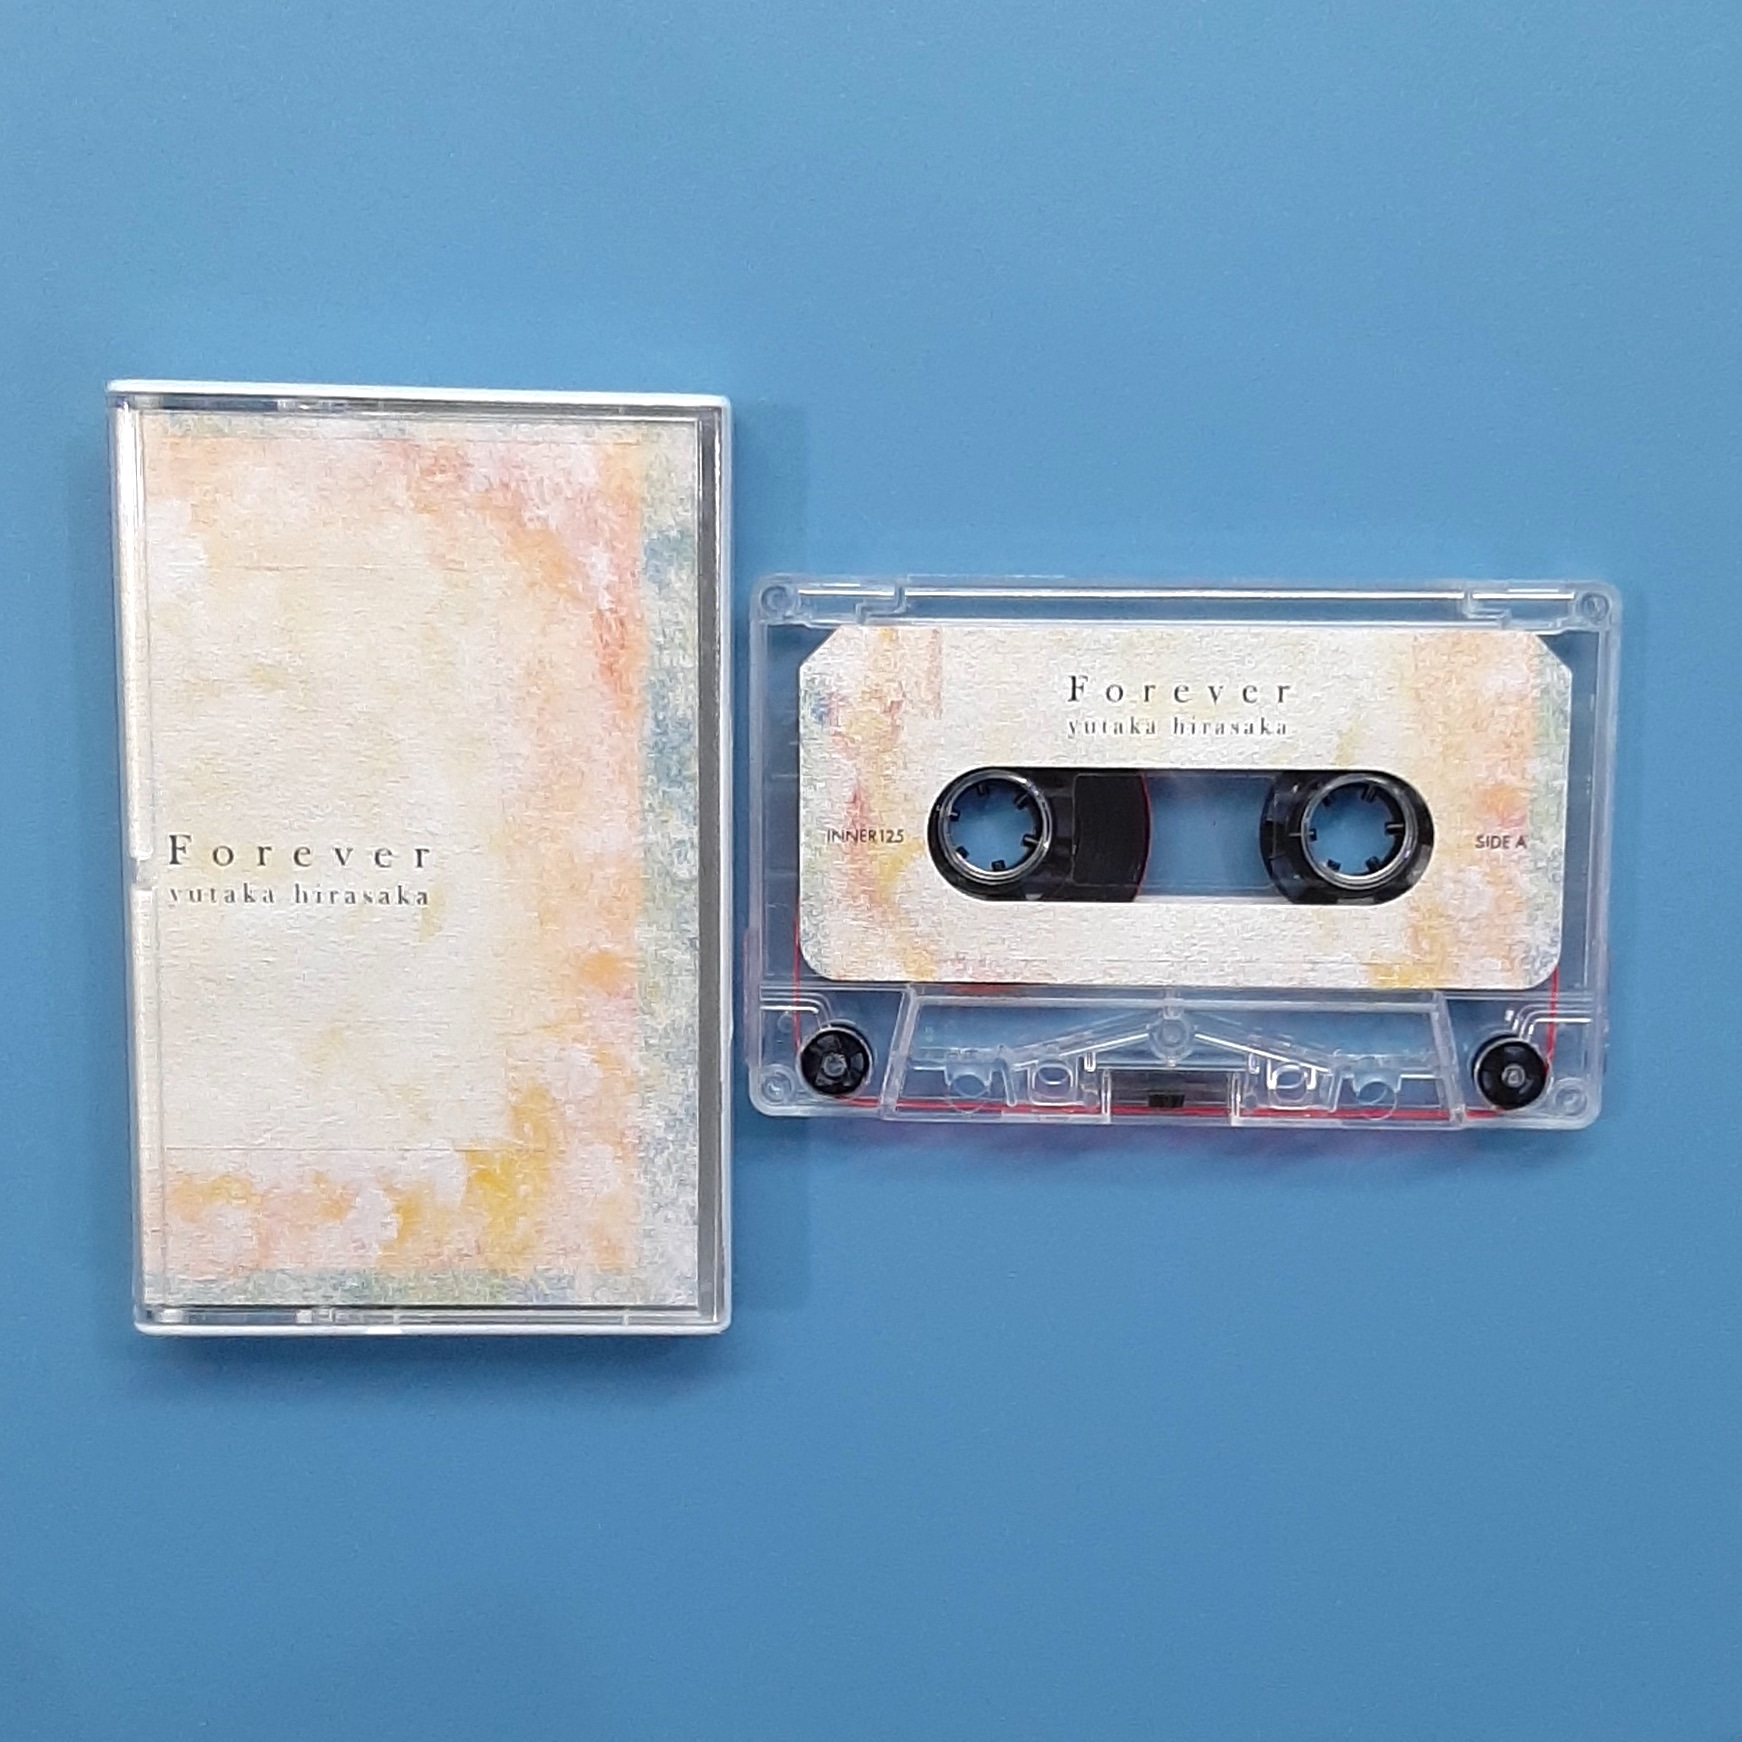 [SOLD] yutaka hirasaka - Forever (Inner Ocean Records)